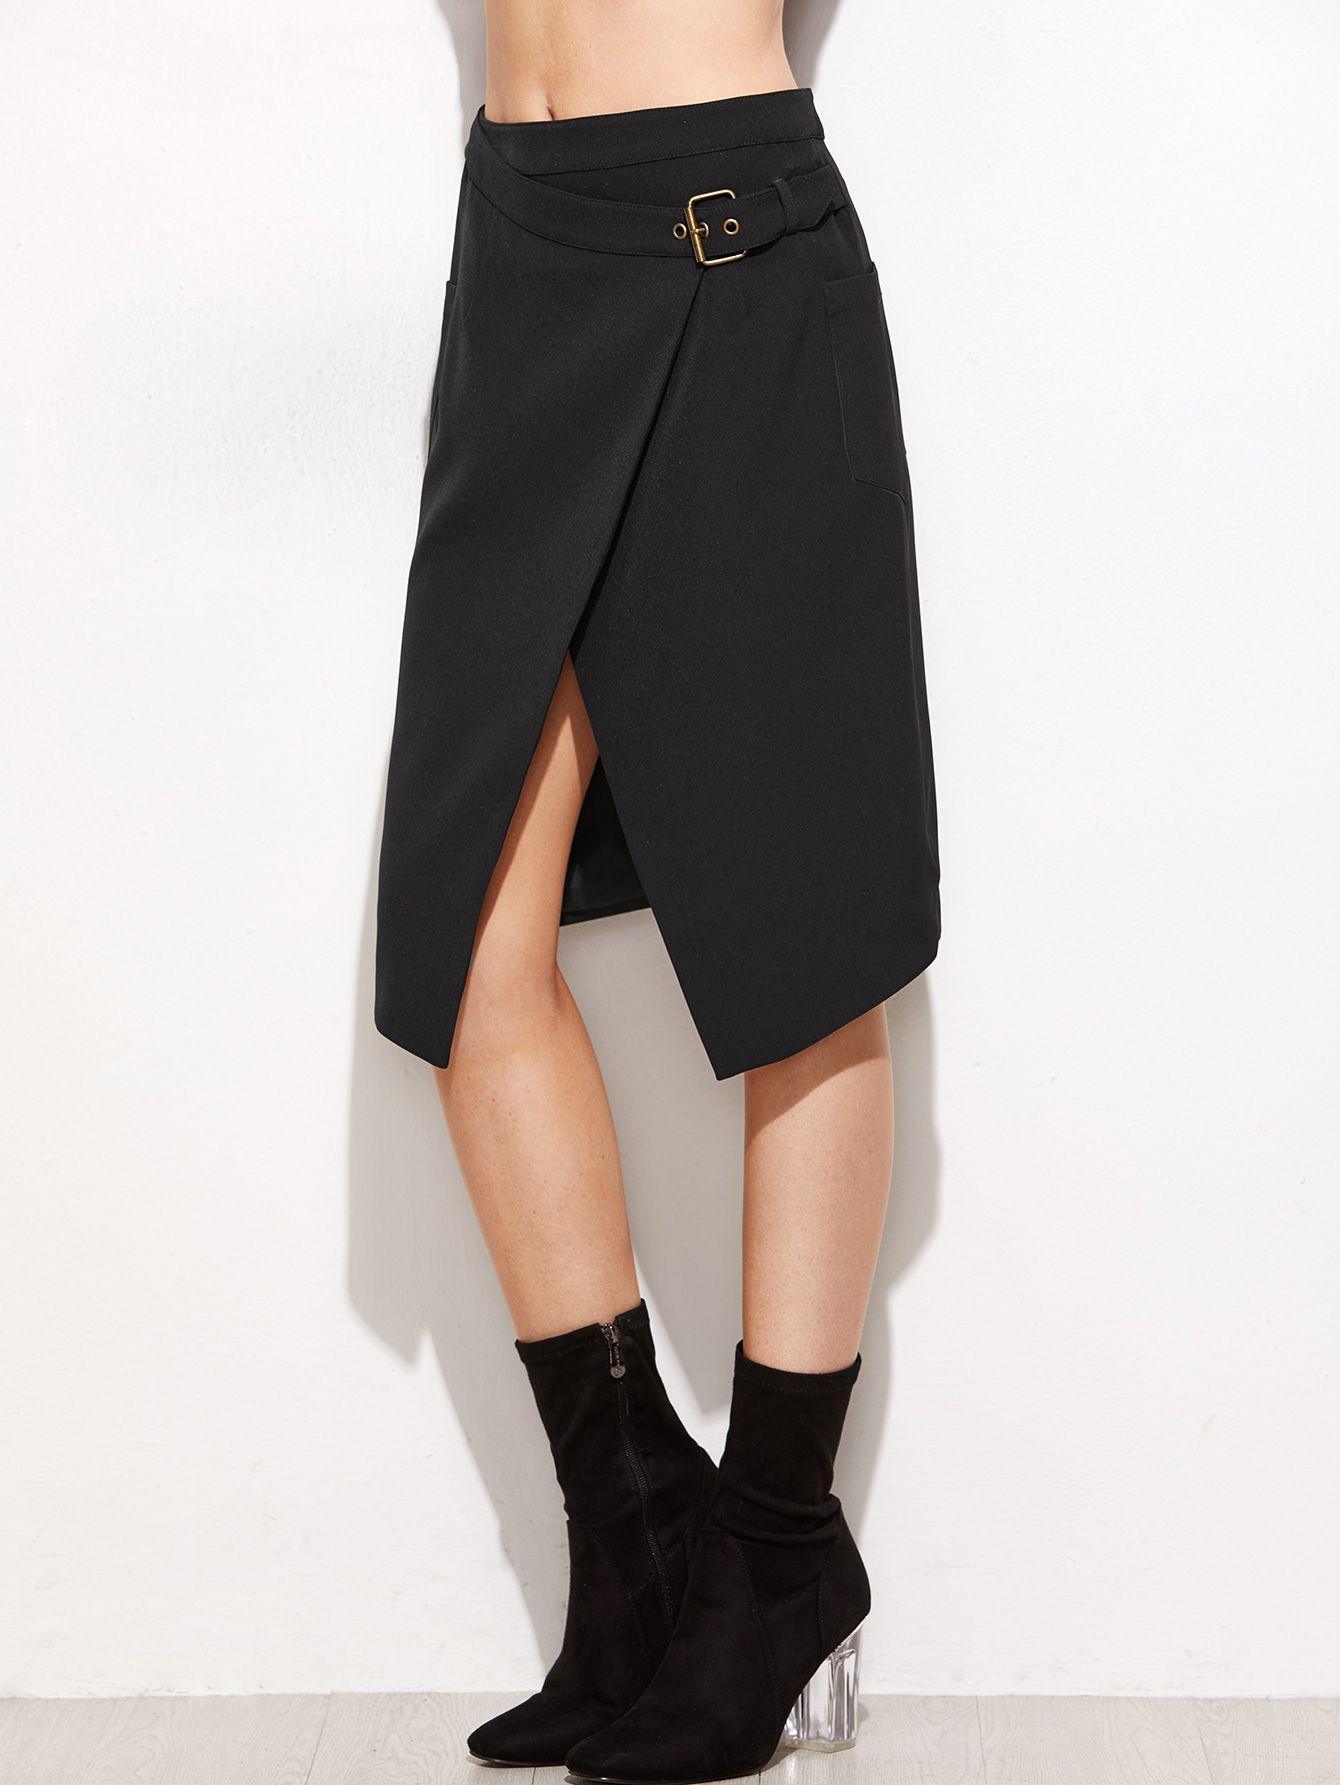 Black Overlap Front Buckle Belted Skirt — 0.00 € ----------------color: Black size: L,M,S,XS